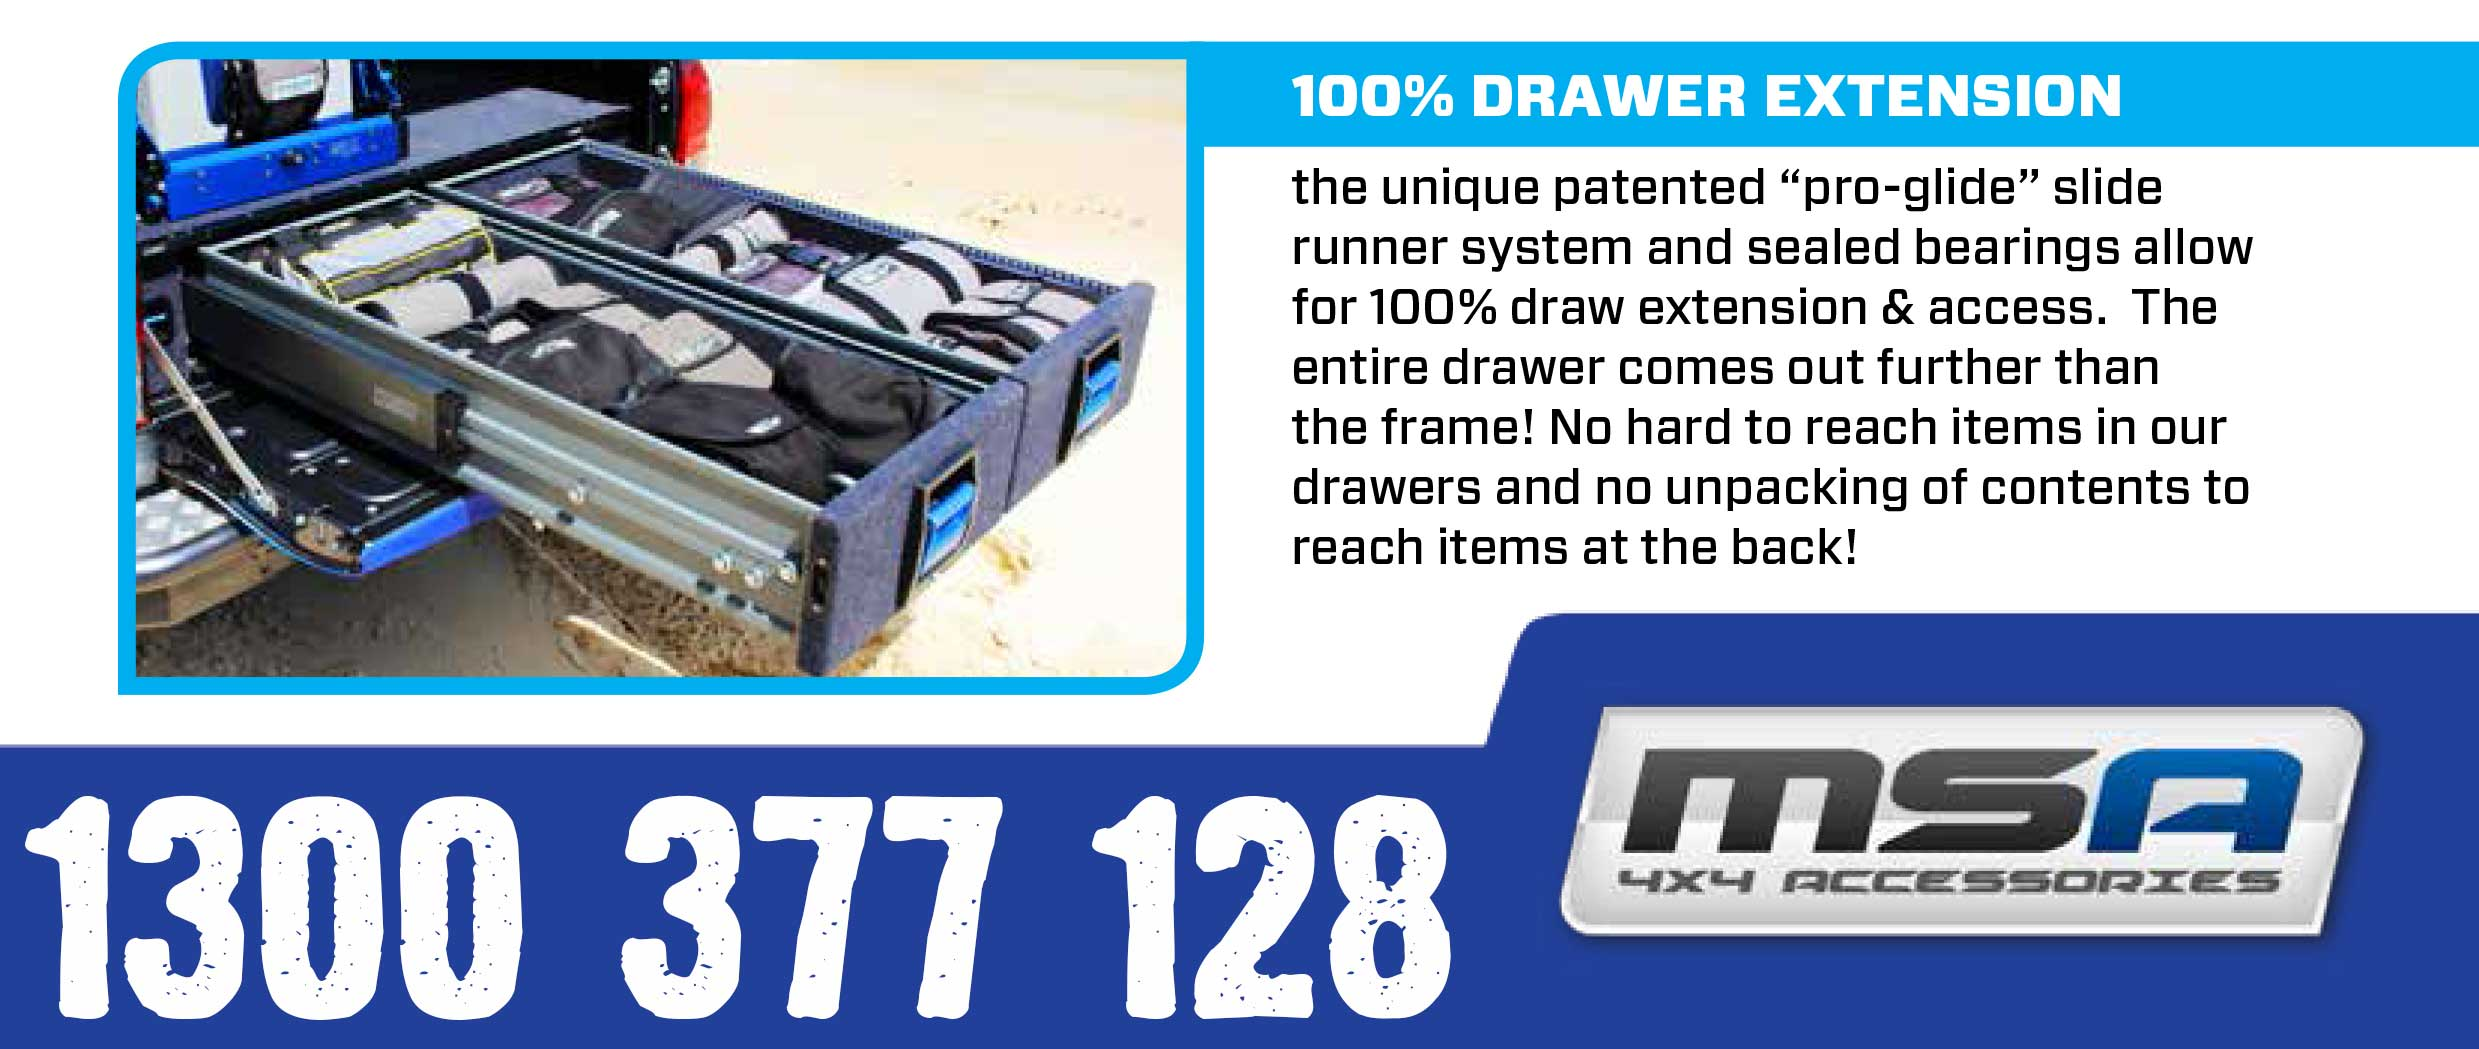 MSA DRAWER SYSTEM | 4WD DRAWER SYSTEM